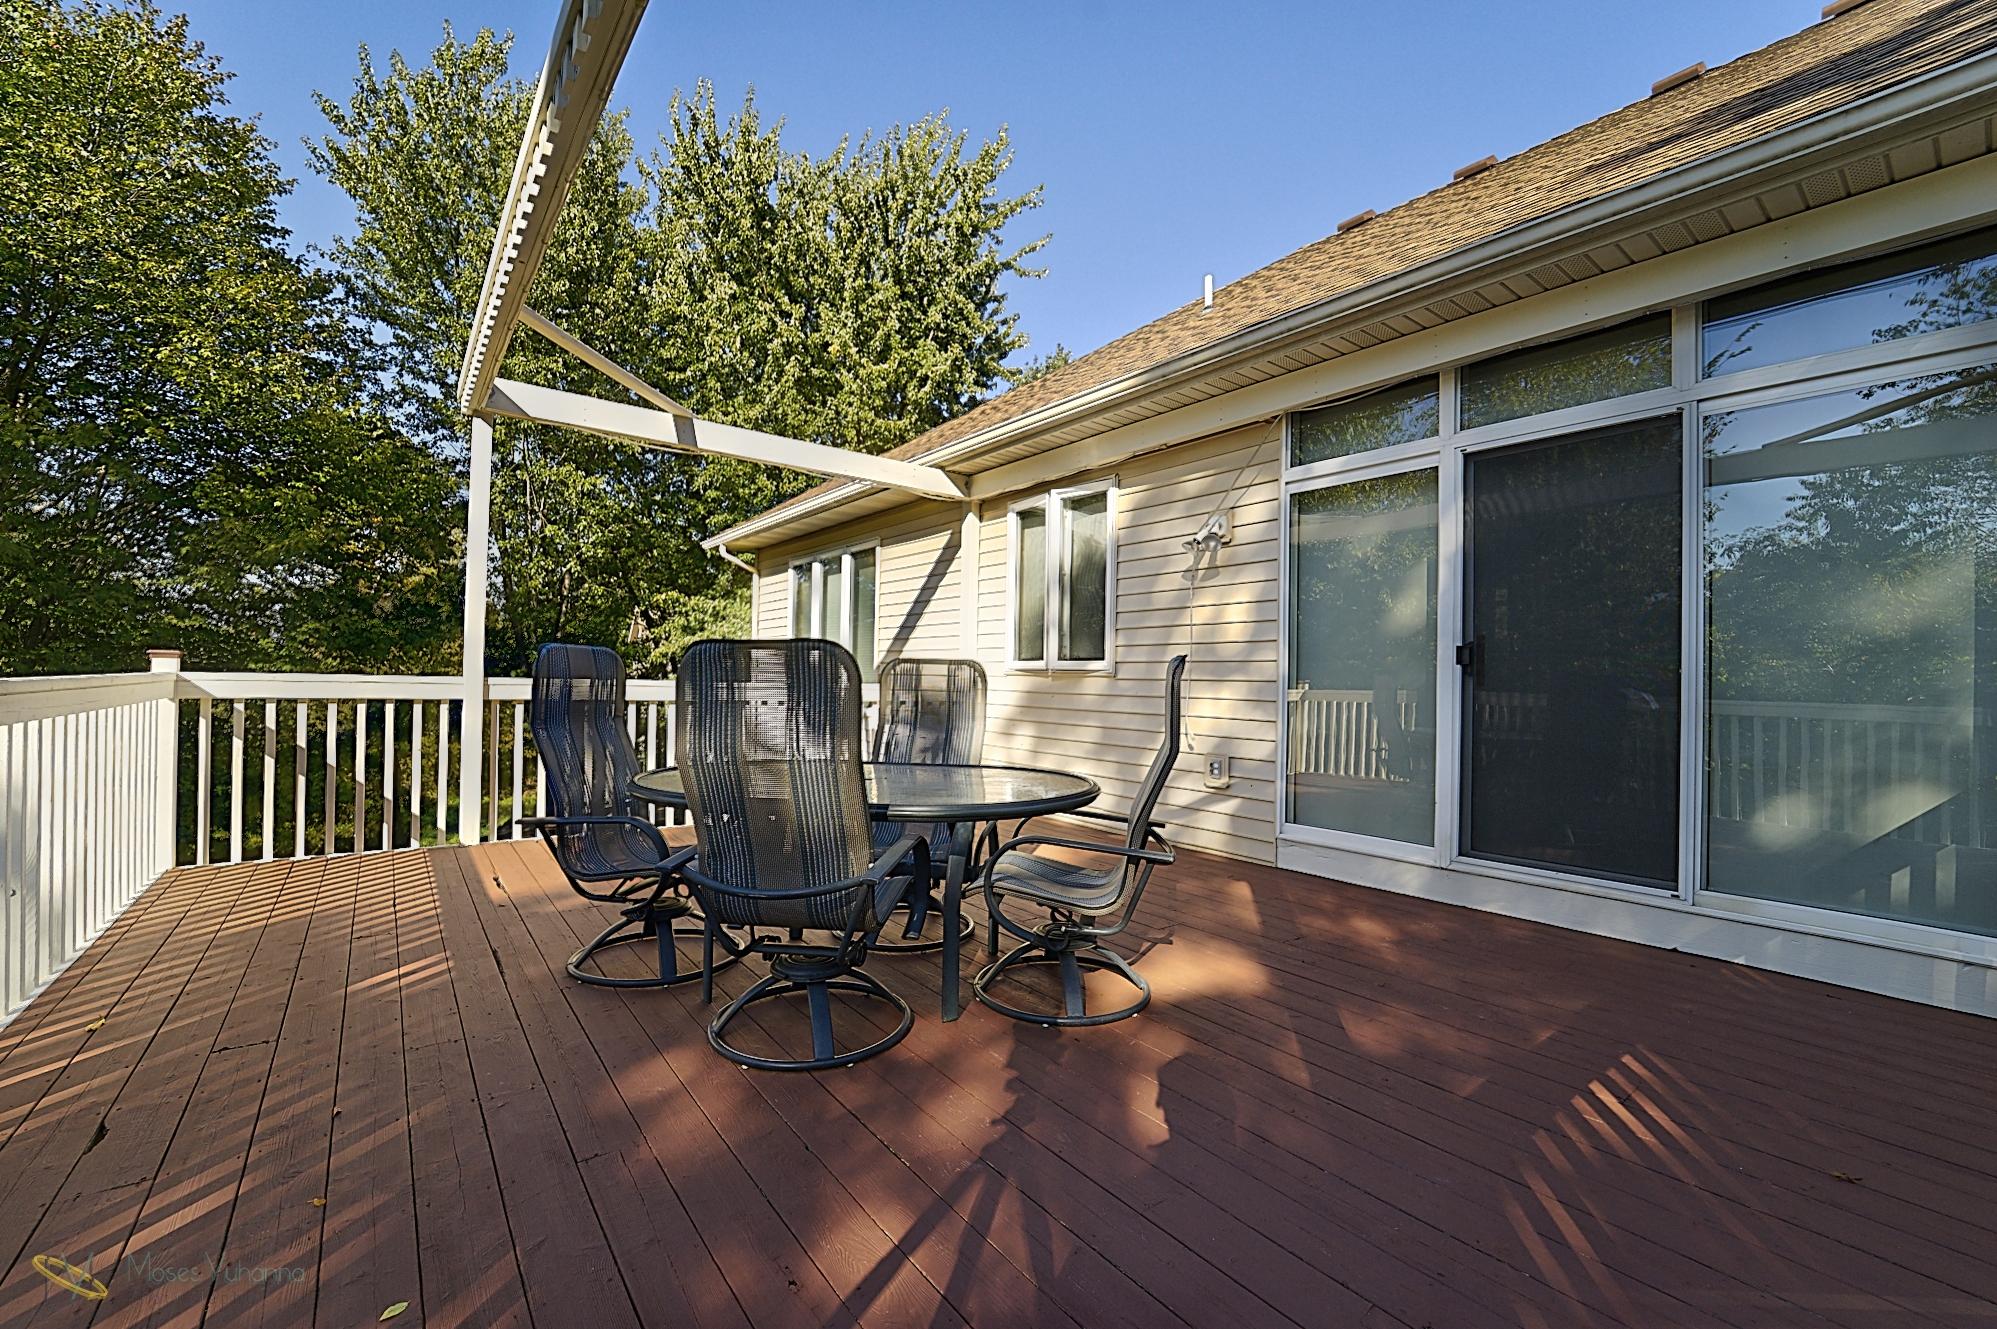 13770-Cottonwood-St-NW-Andover 20 Deck.jpg